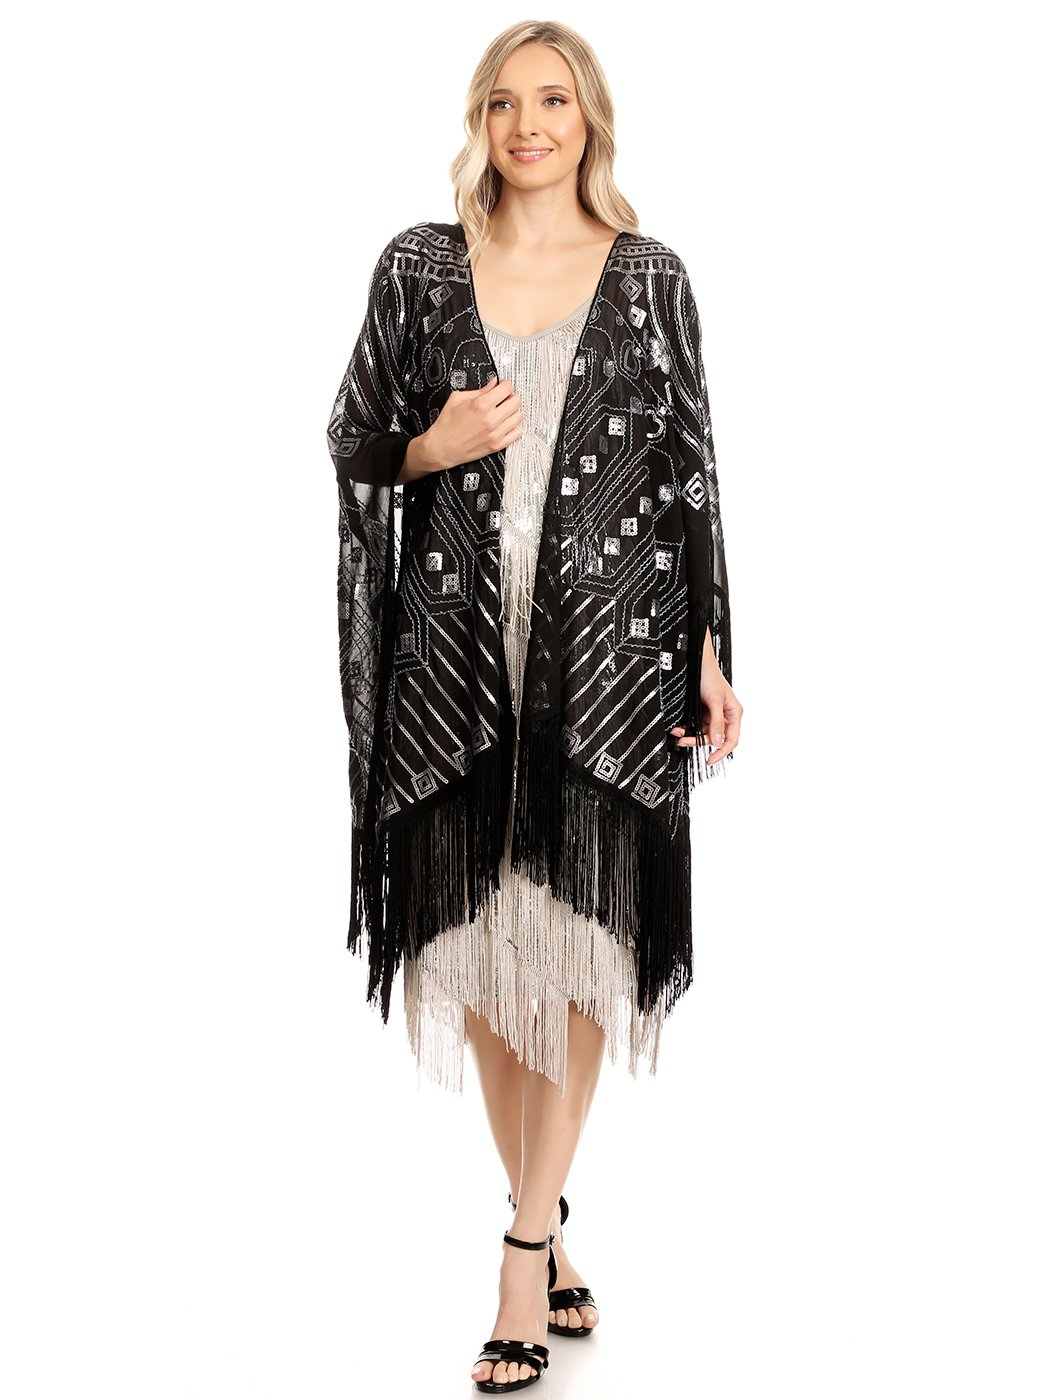 Anna-Kaci Womens Oversized 1920s Hand Beaded Fringed Sequin Evening Shawl Wrap, Black, Onesize by Anna-Kaci